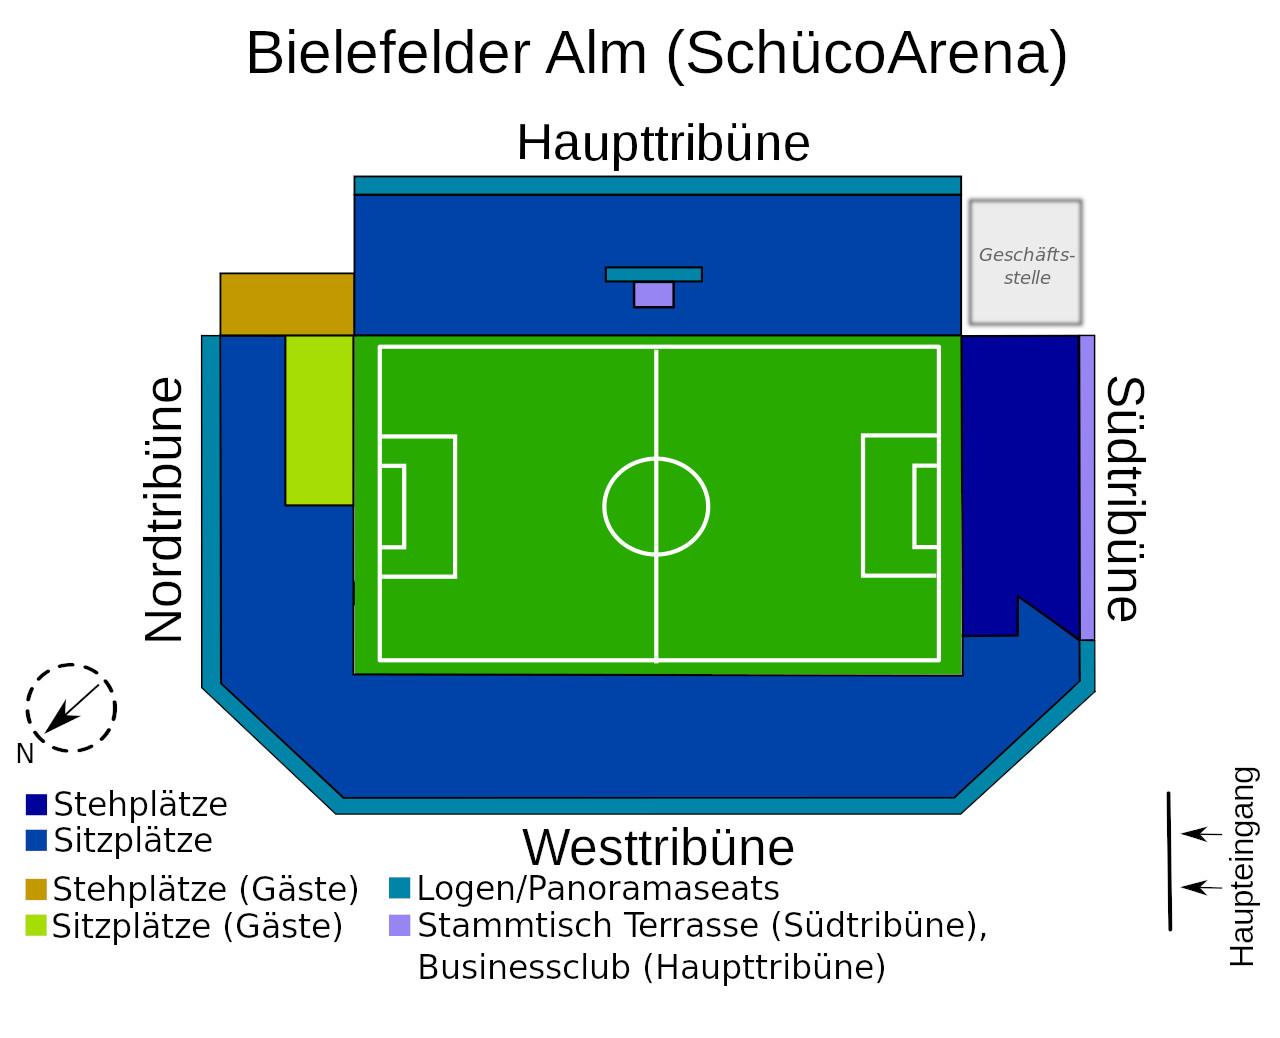 Schüco Arena (Bielefelder Alm) Seating Plan